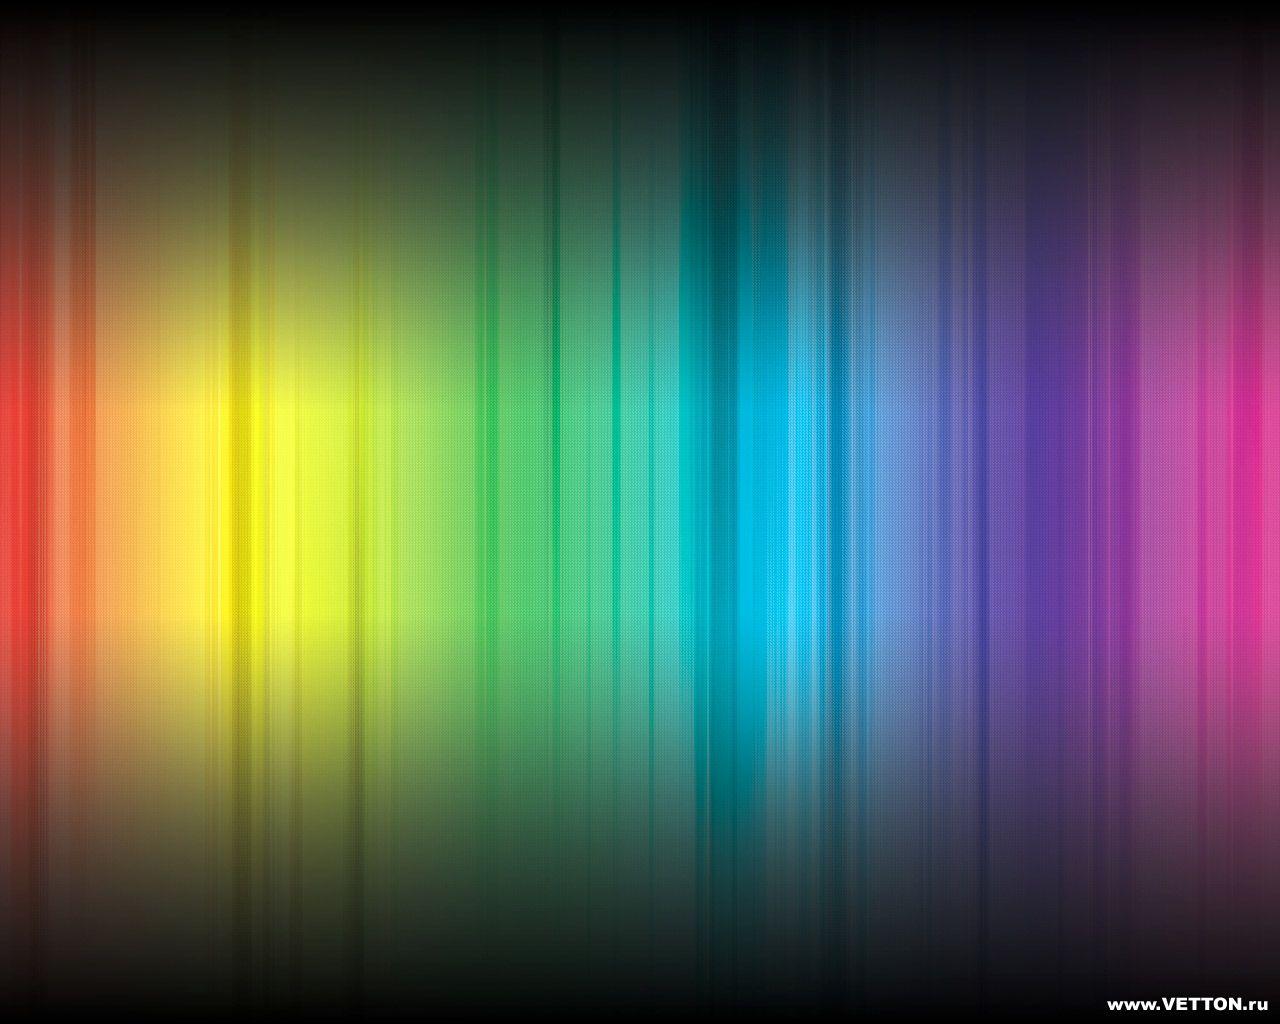 very beautiful colorful multicolors bars wallpaper for desktop 1280x1024